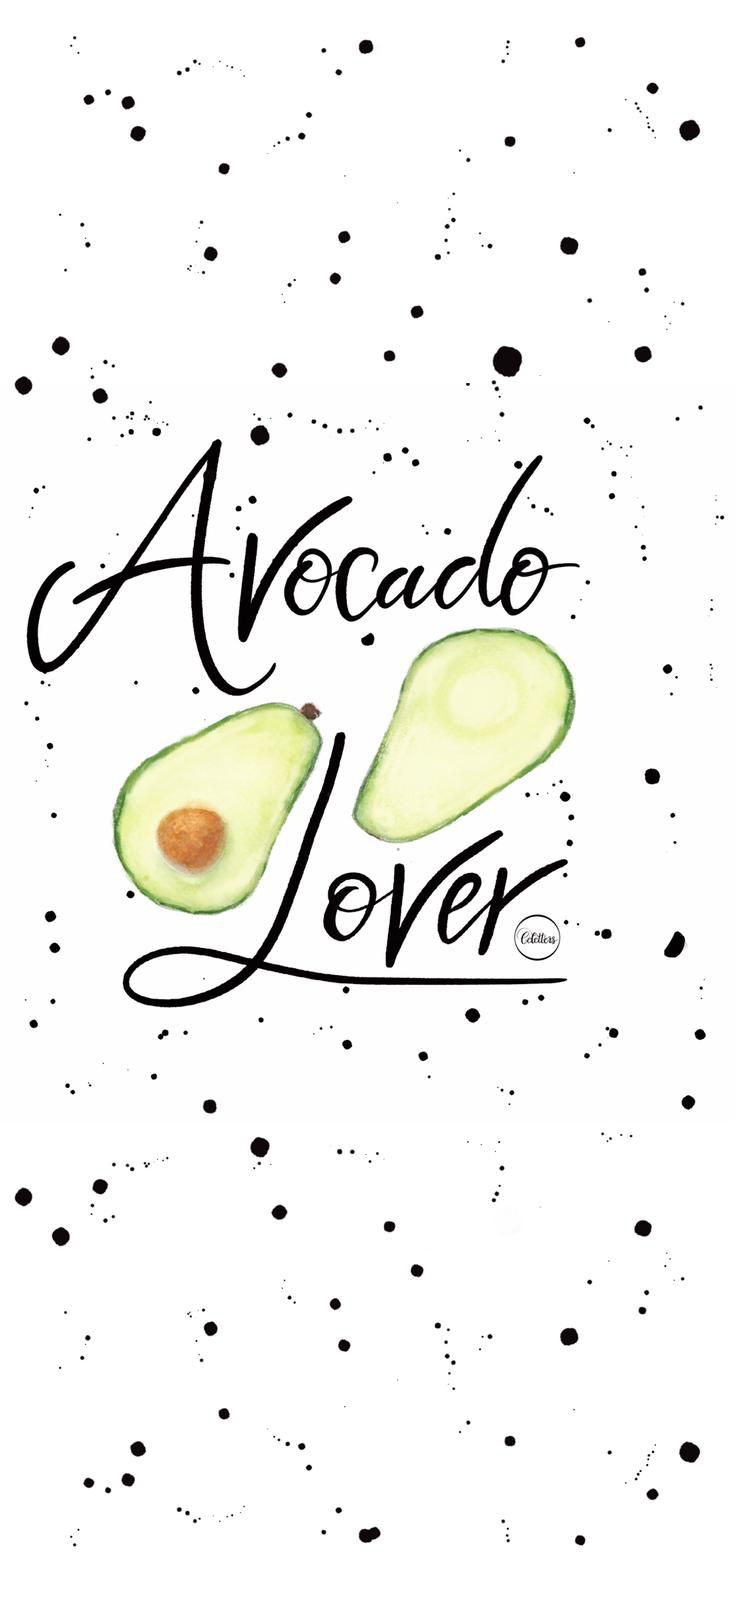 Avocado, iPhone wallpaper, calligraphy, watercolor